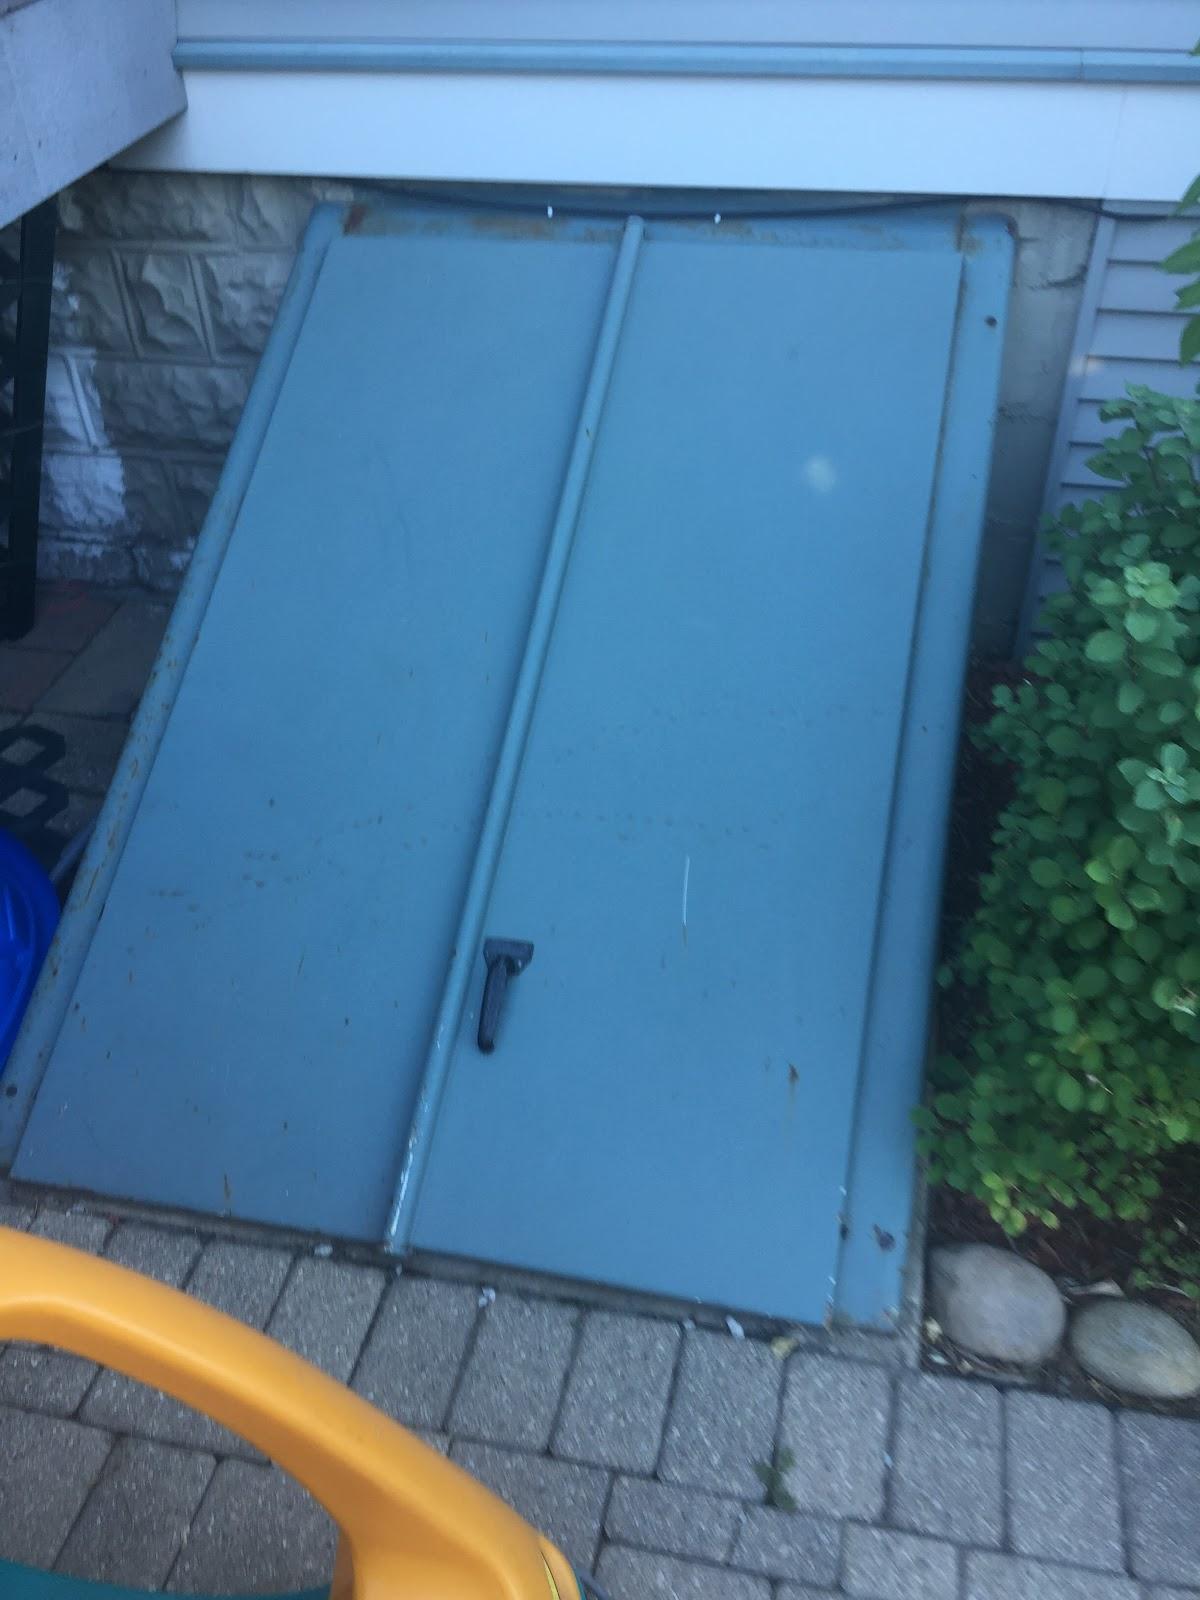 Mysteries Of Life September - Metal basement doors